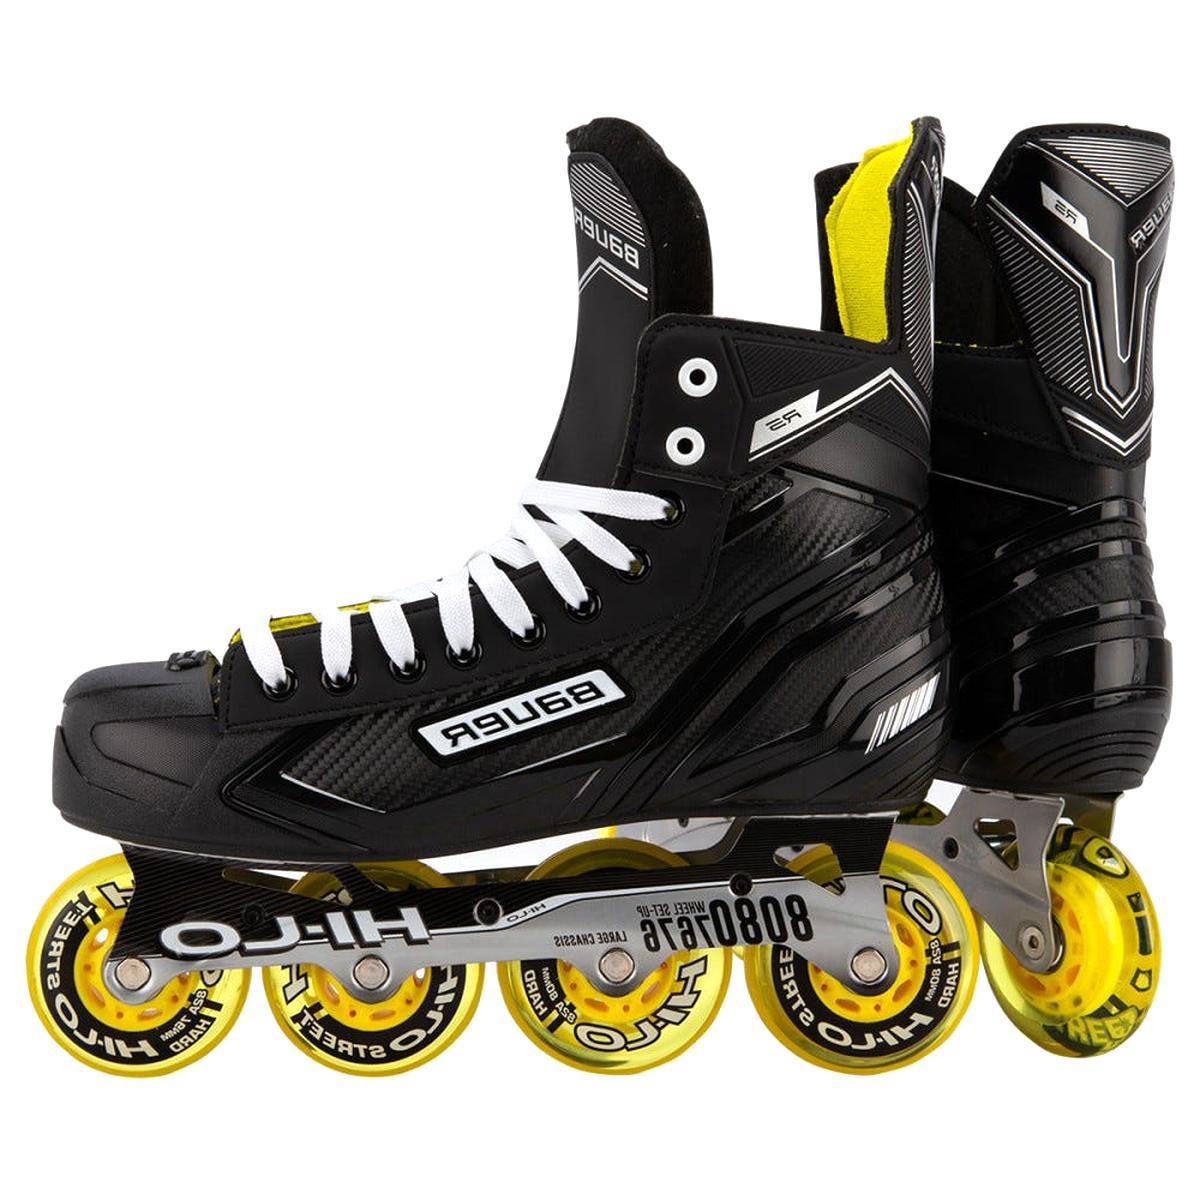 bauer roller blades for sale